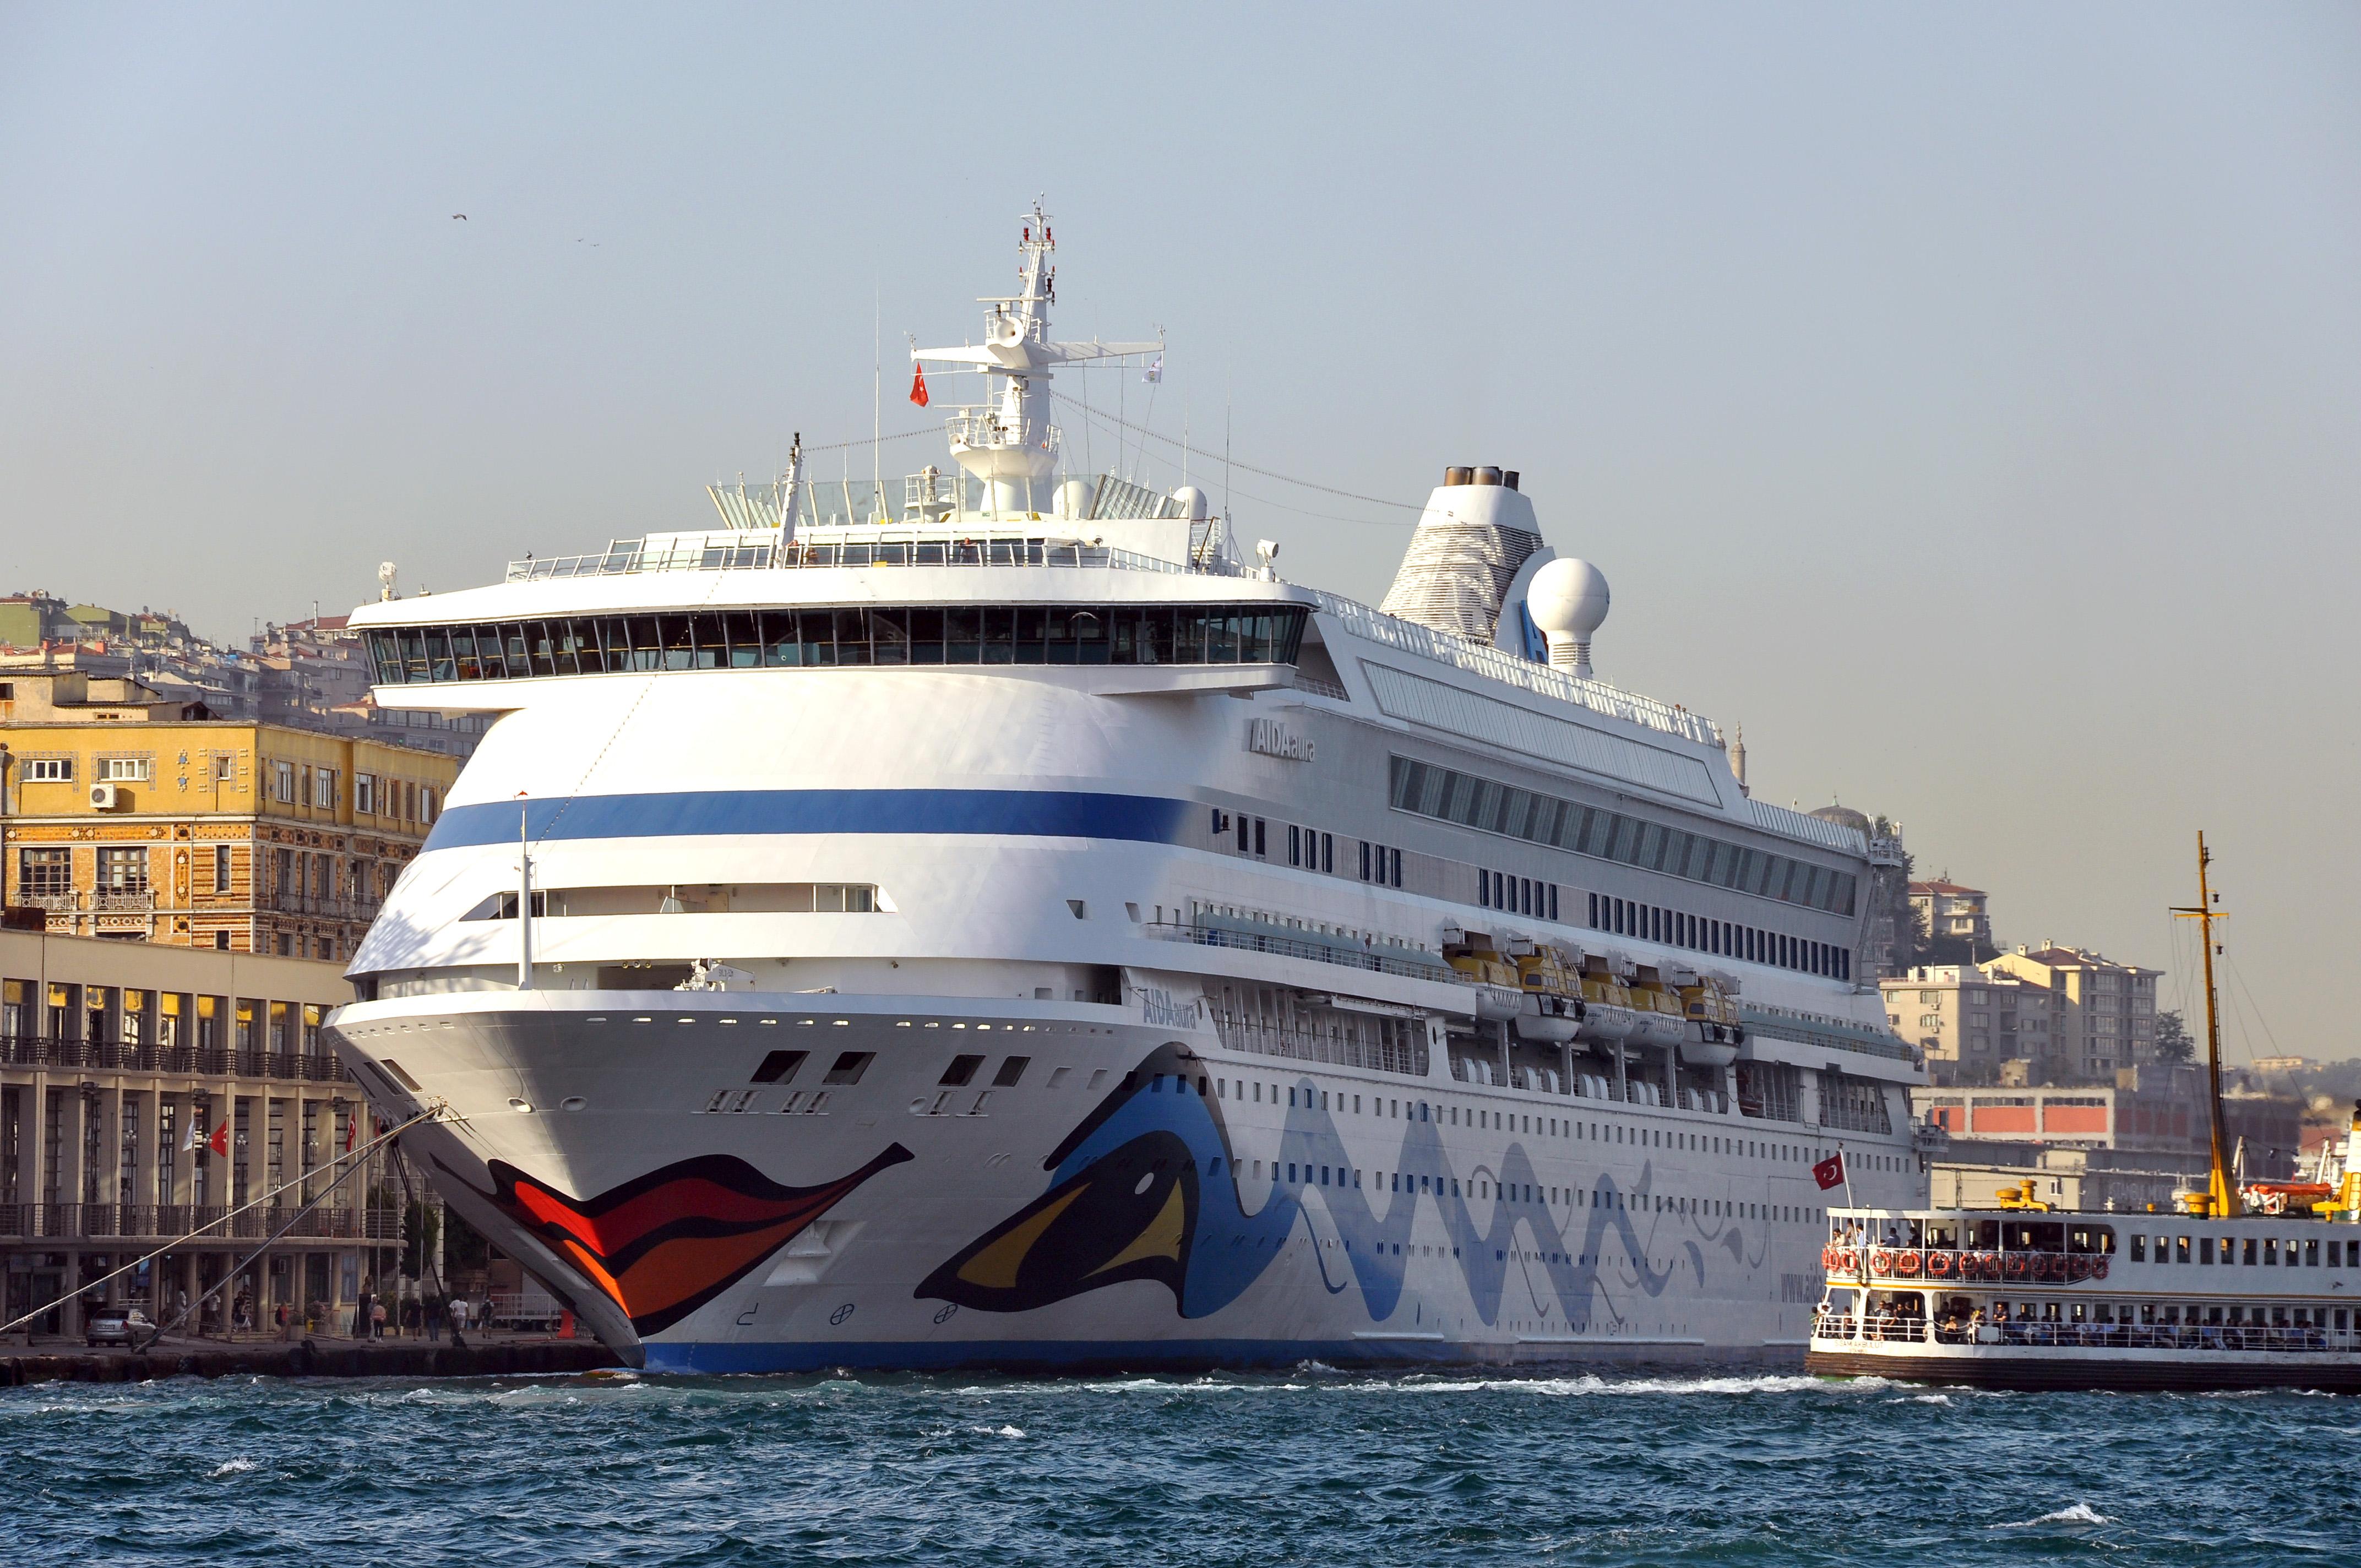 C A Turkey Istanbul Fichier:Port of Istanb...